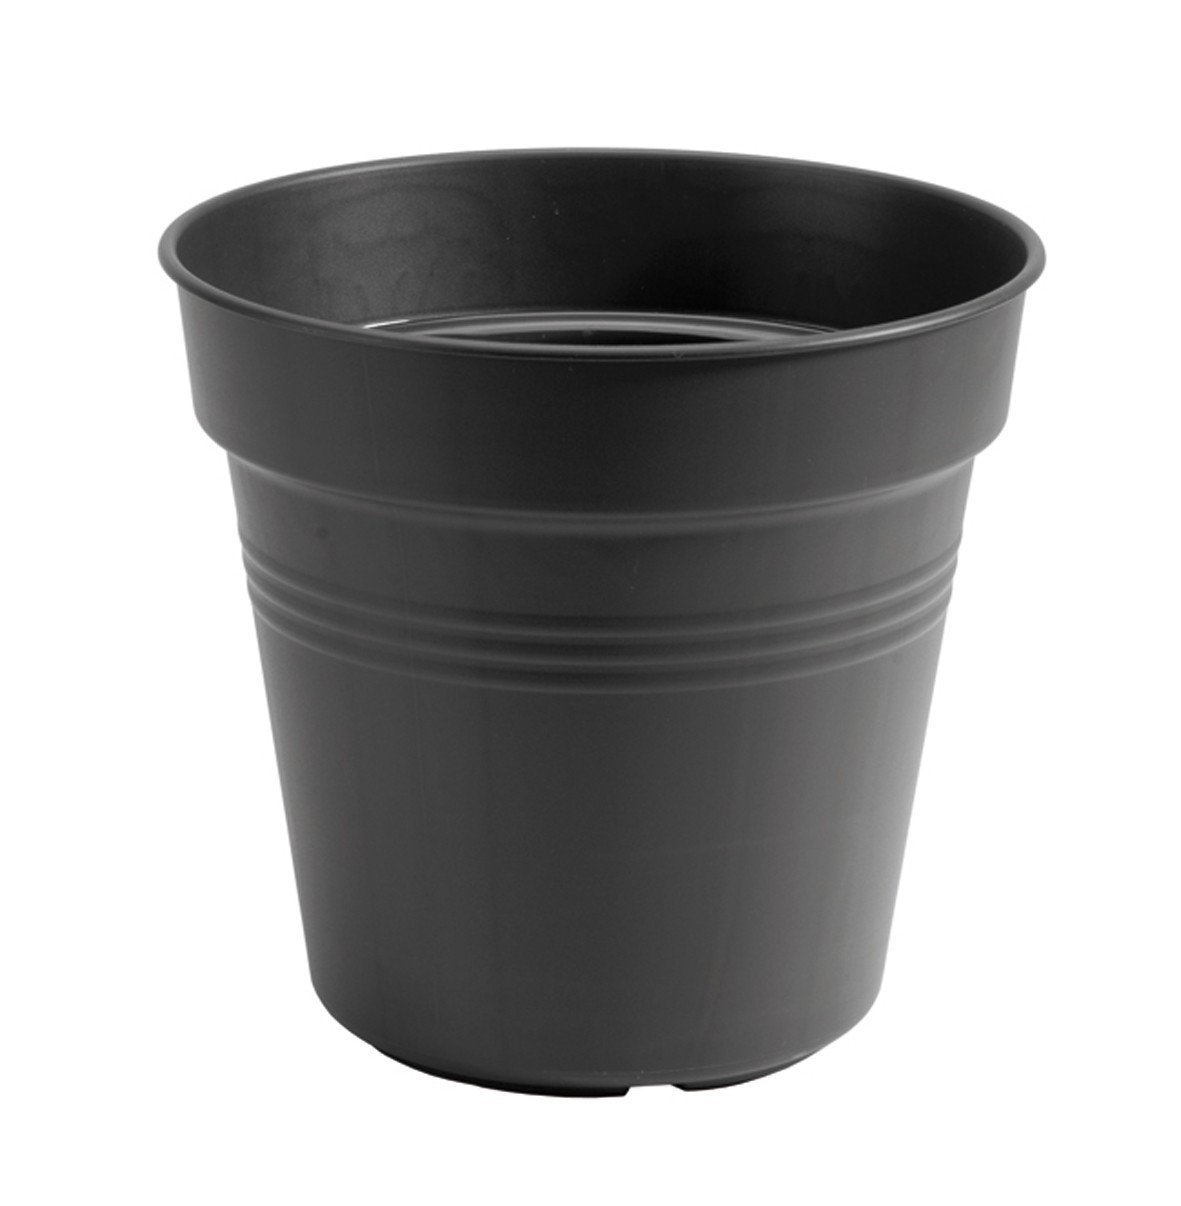 Bloempot Green basics kweekpot 24 cm living black elho